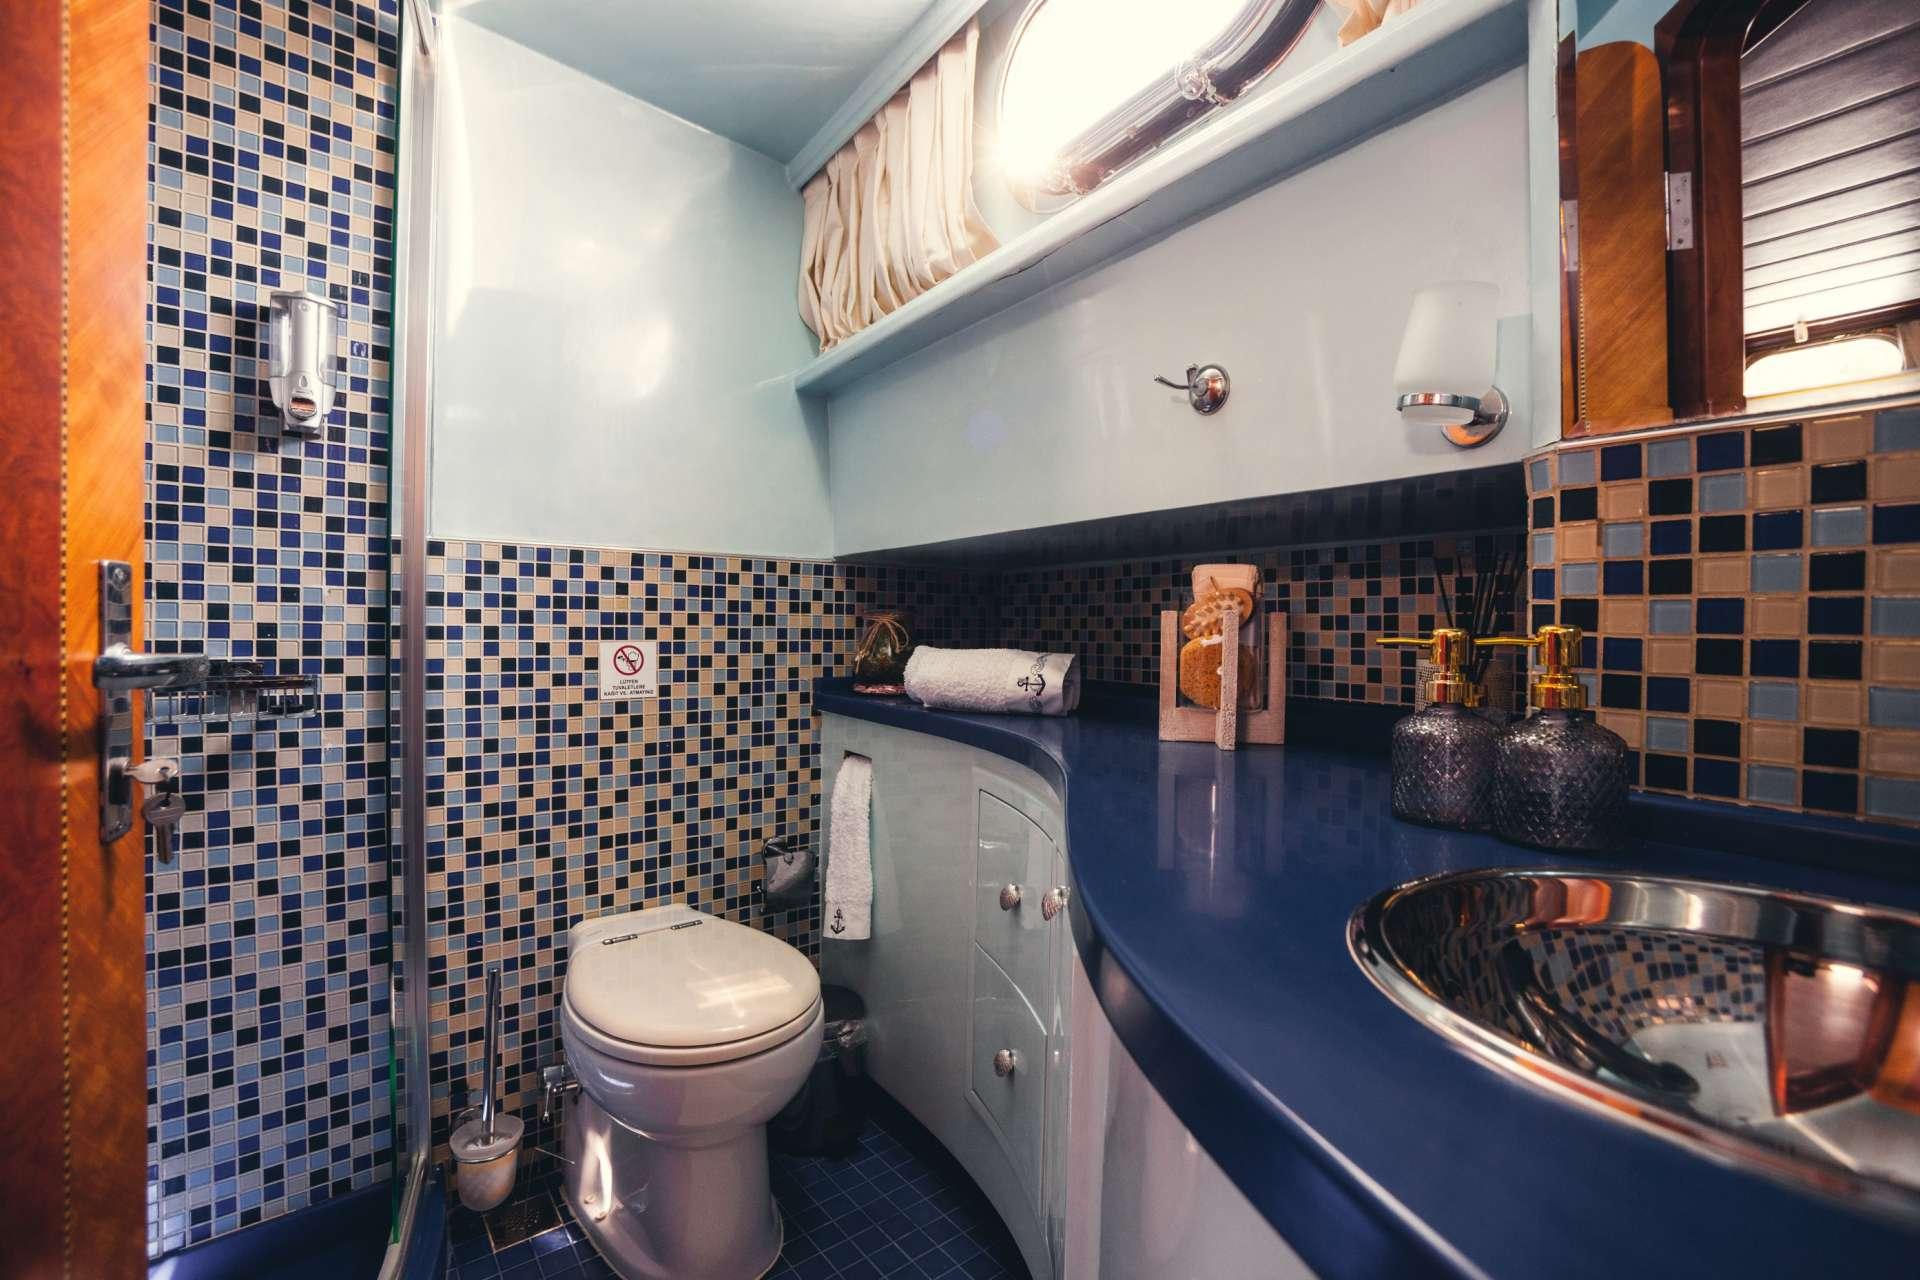 Bathroom of the VIP cabin